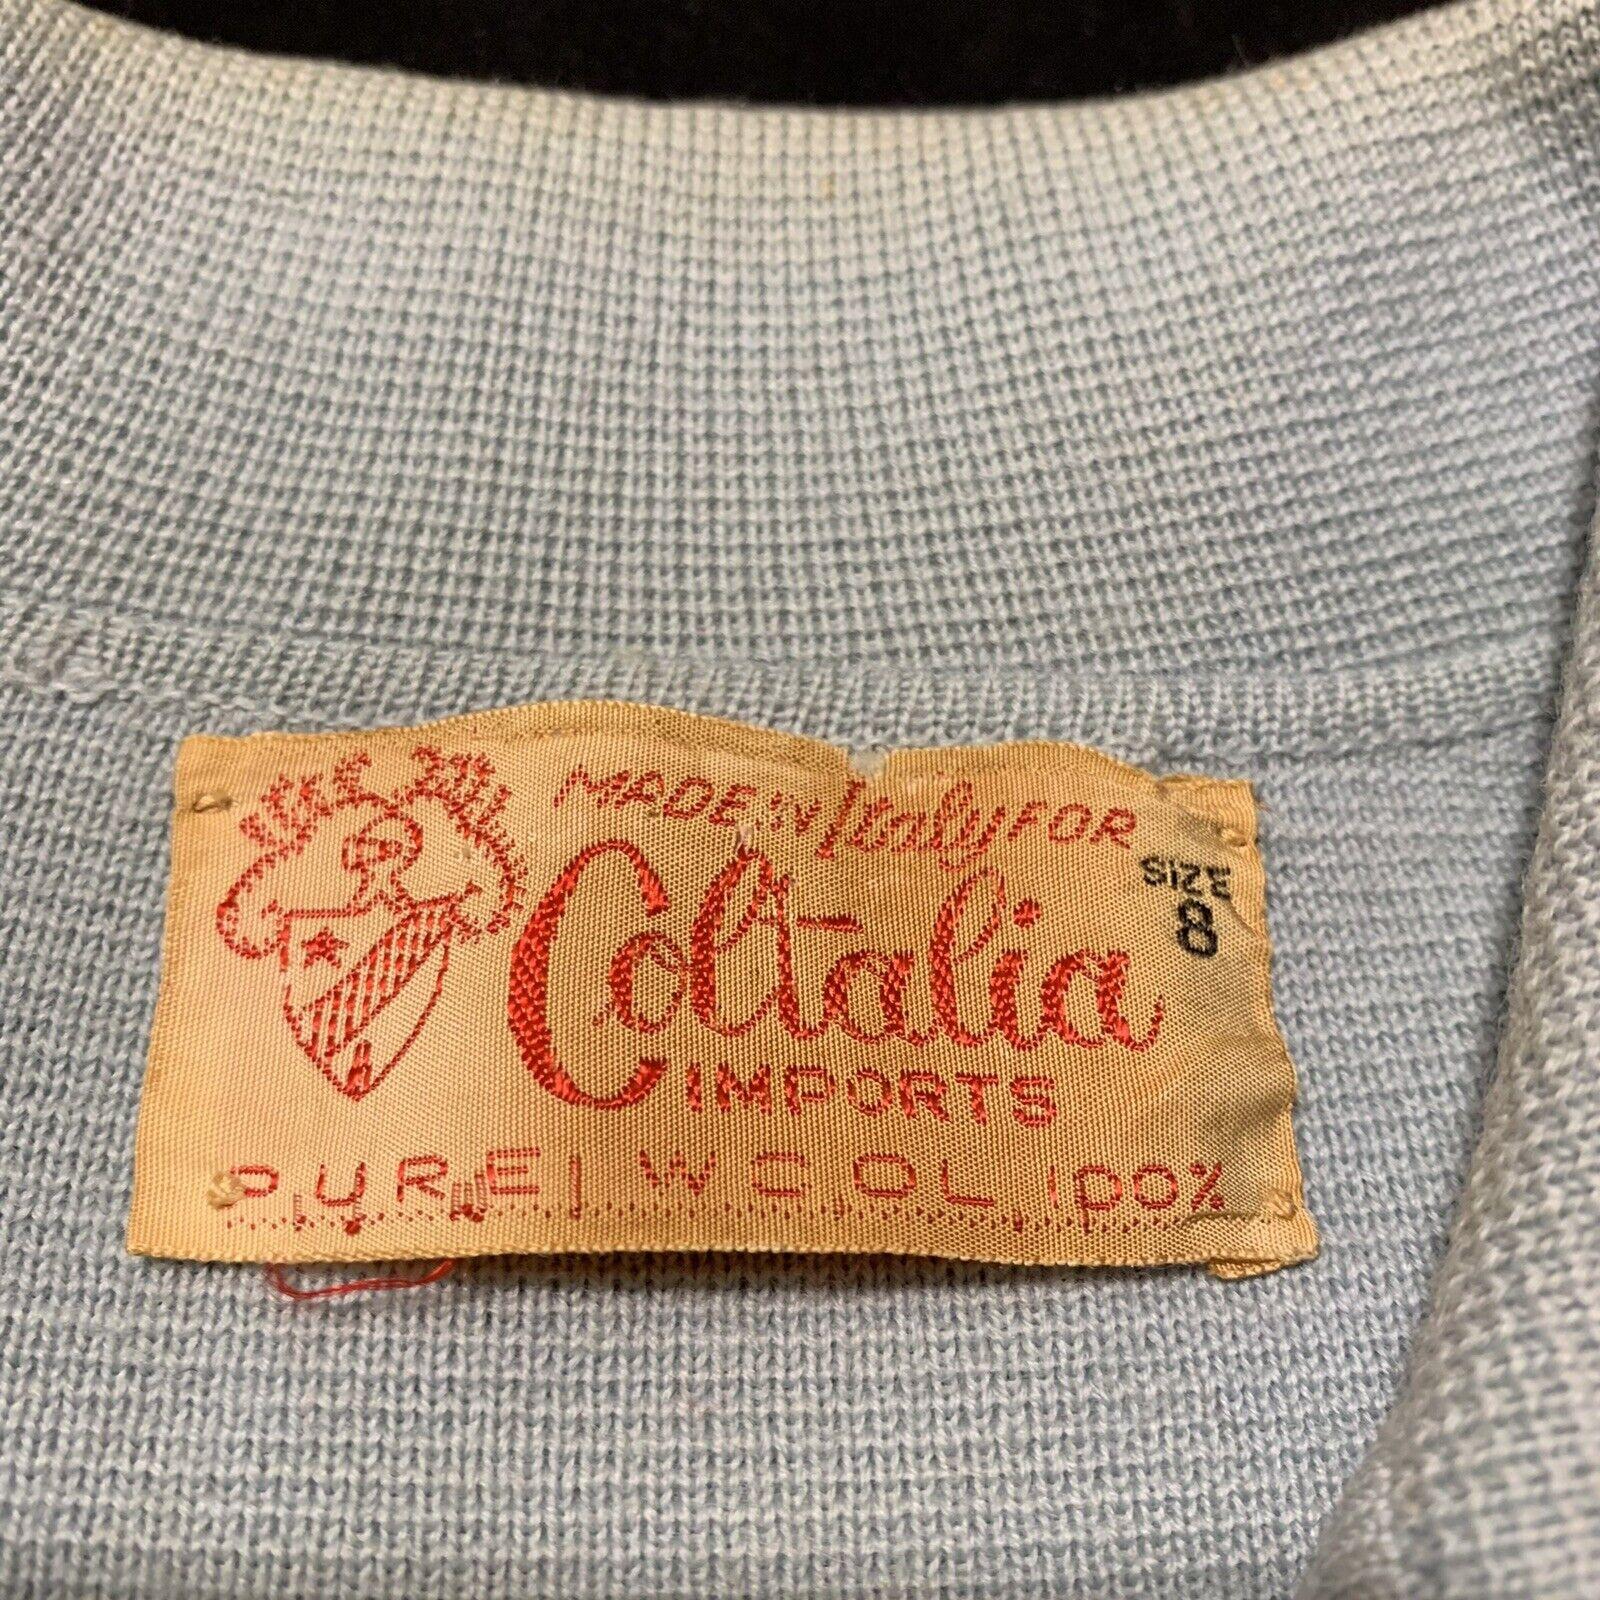 Vintage Coltalia Italy Wool Open Blazer Skirt Sui… - image 2